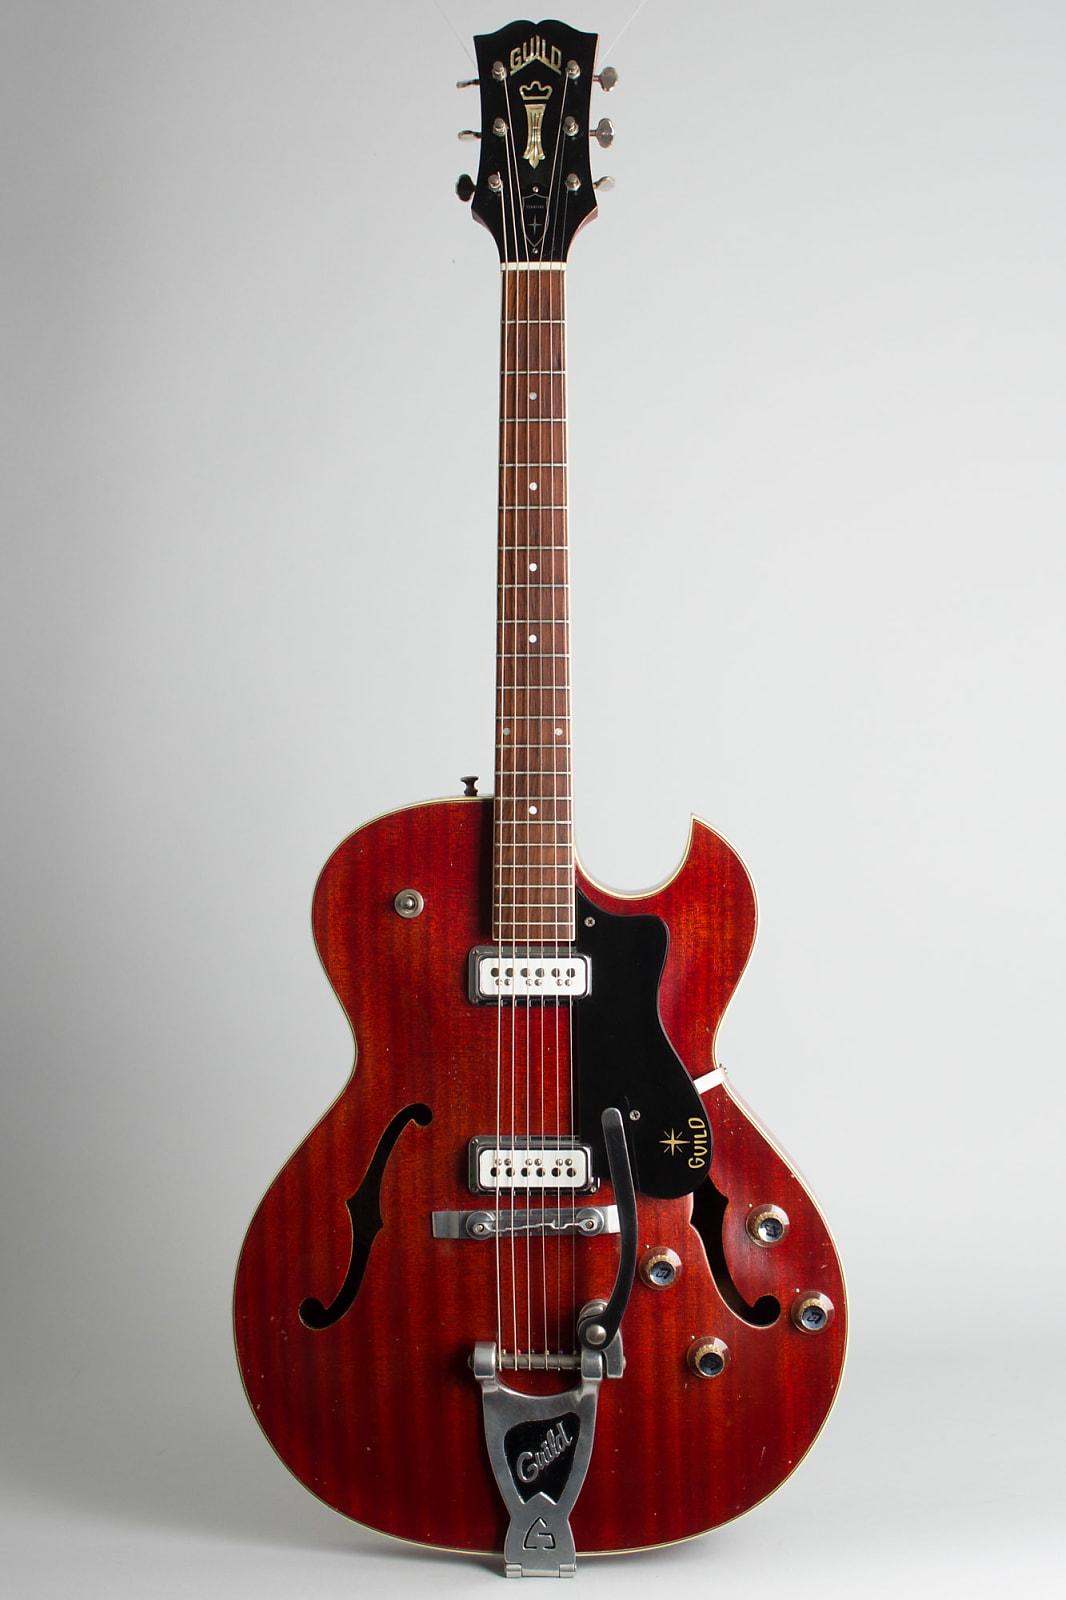 Guild  Starfire III Thinline Hollow Body Electric Guitar (1963), ser. #23173, original black hard shell case.